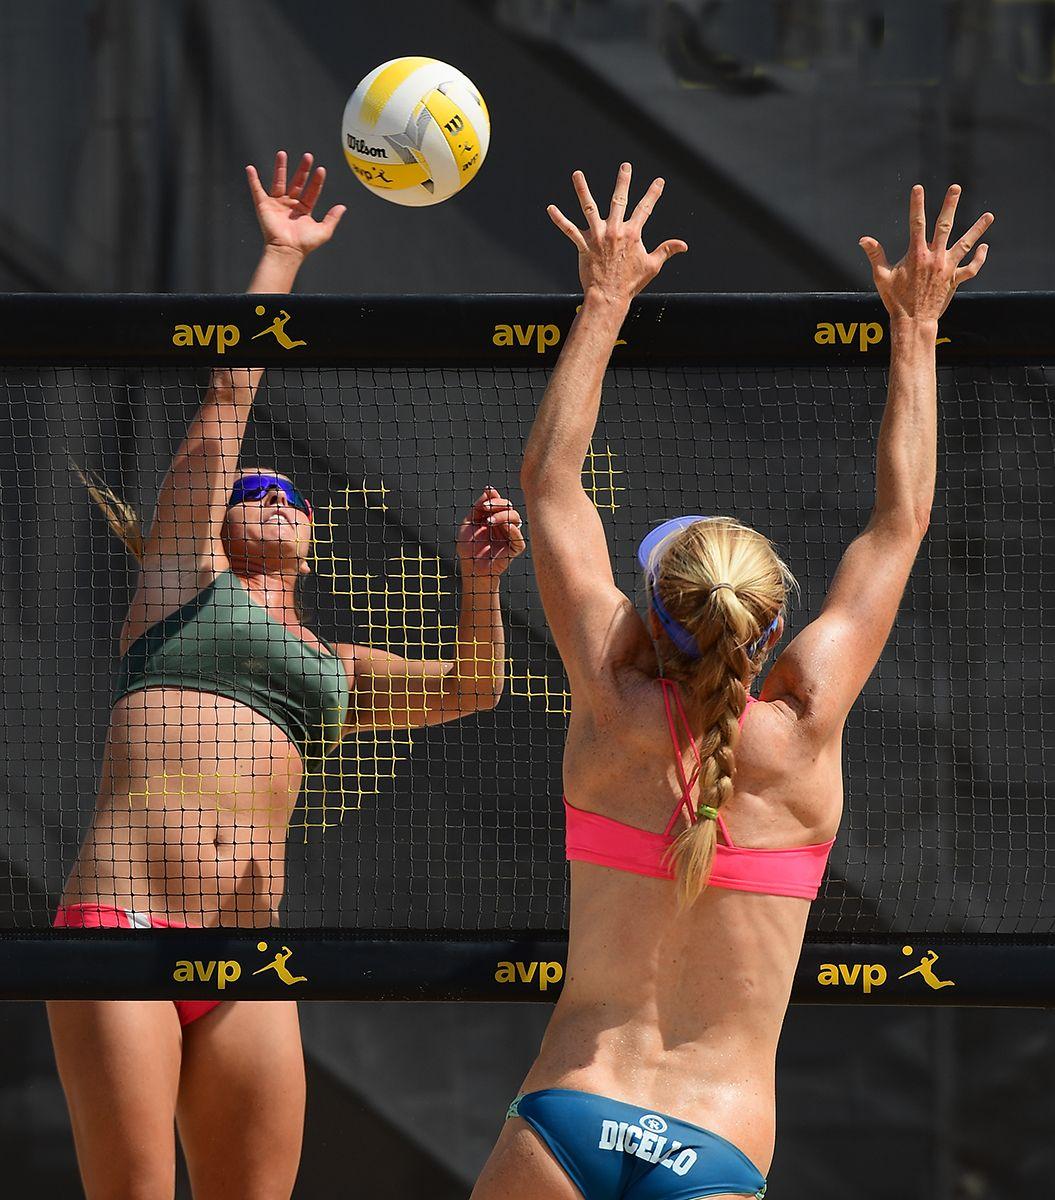 Avp Gold Series New York City Open 2017 Photo Gallery Avp Beach Volleyball 2017 Photos Volleyball Articles Beach Volleyball